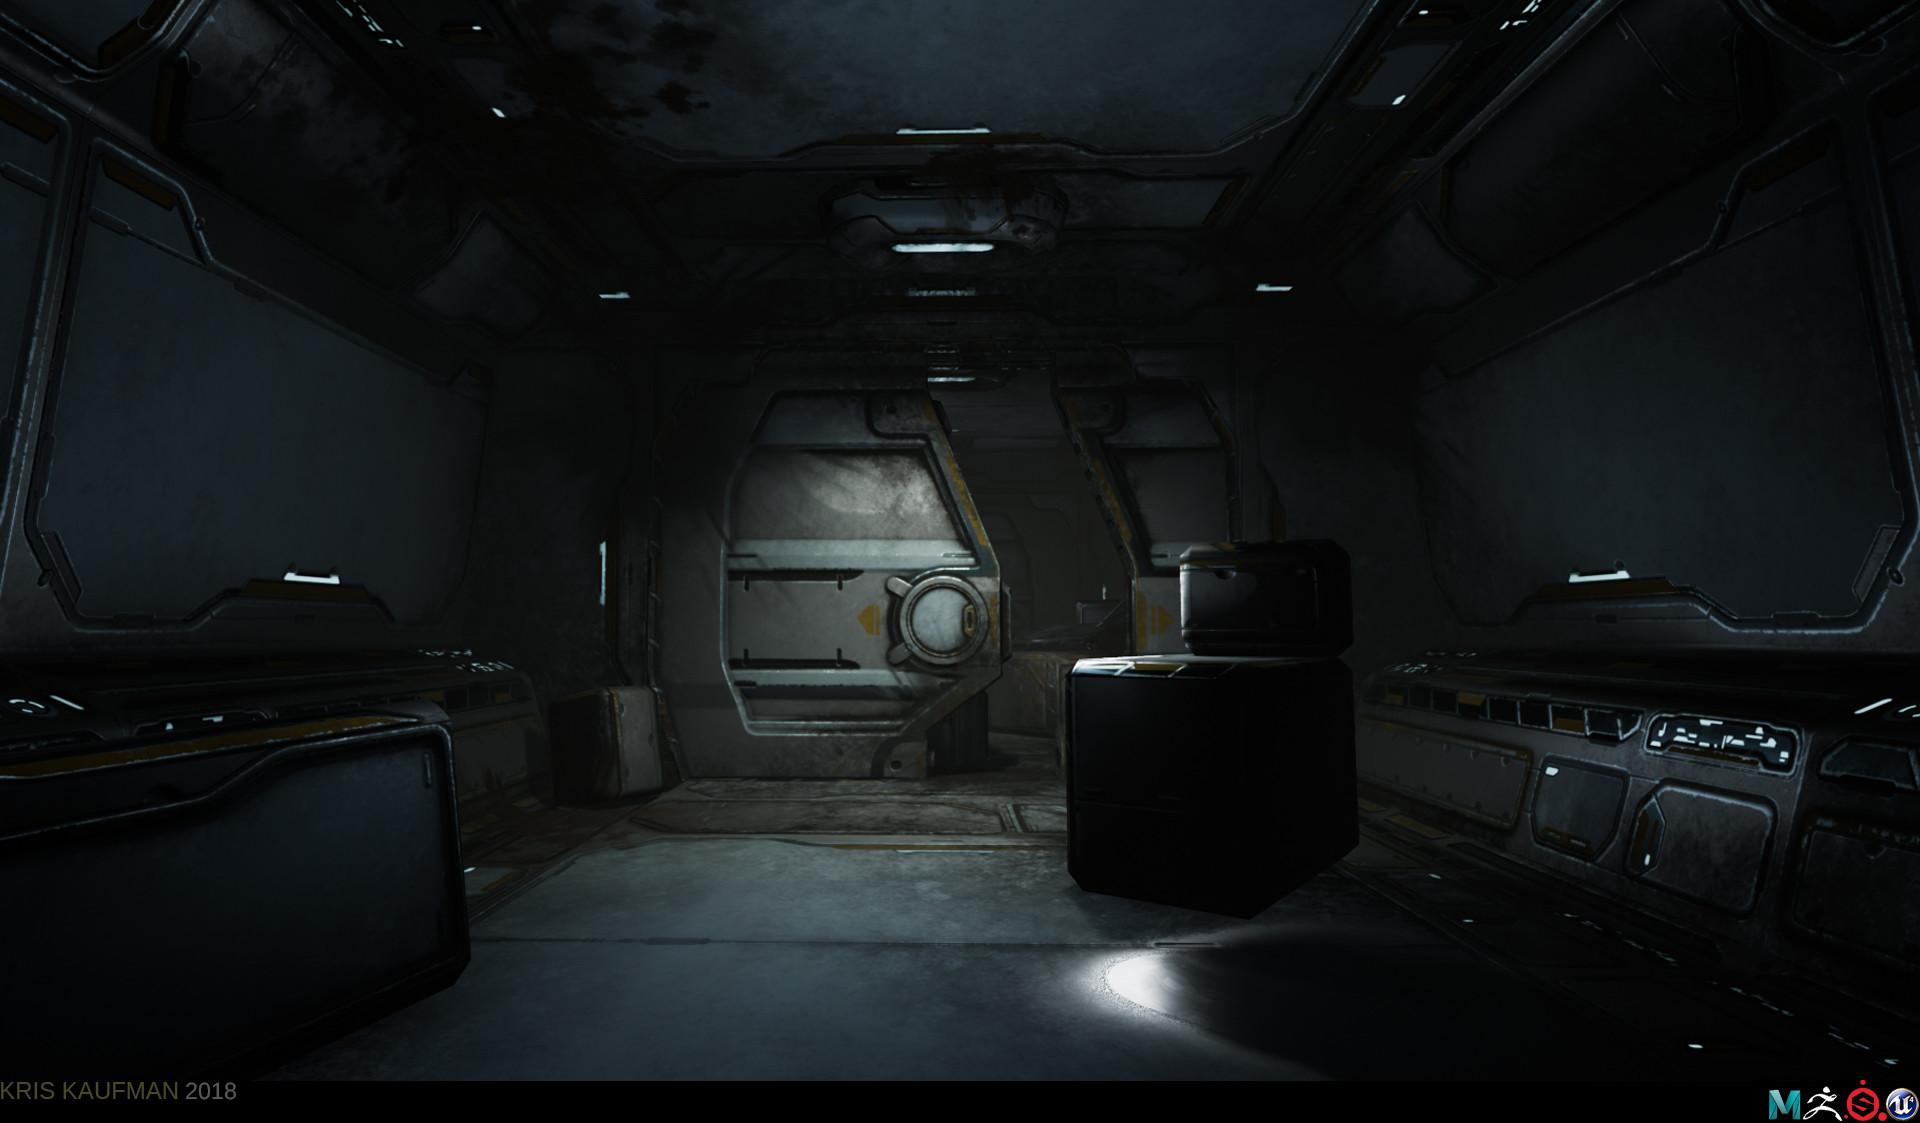 Kris kaufman corridor 04